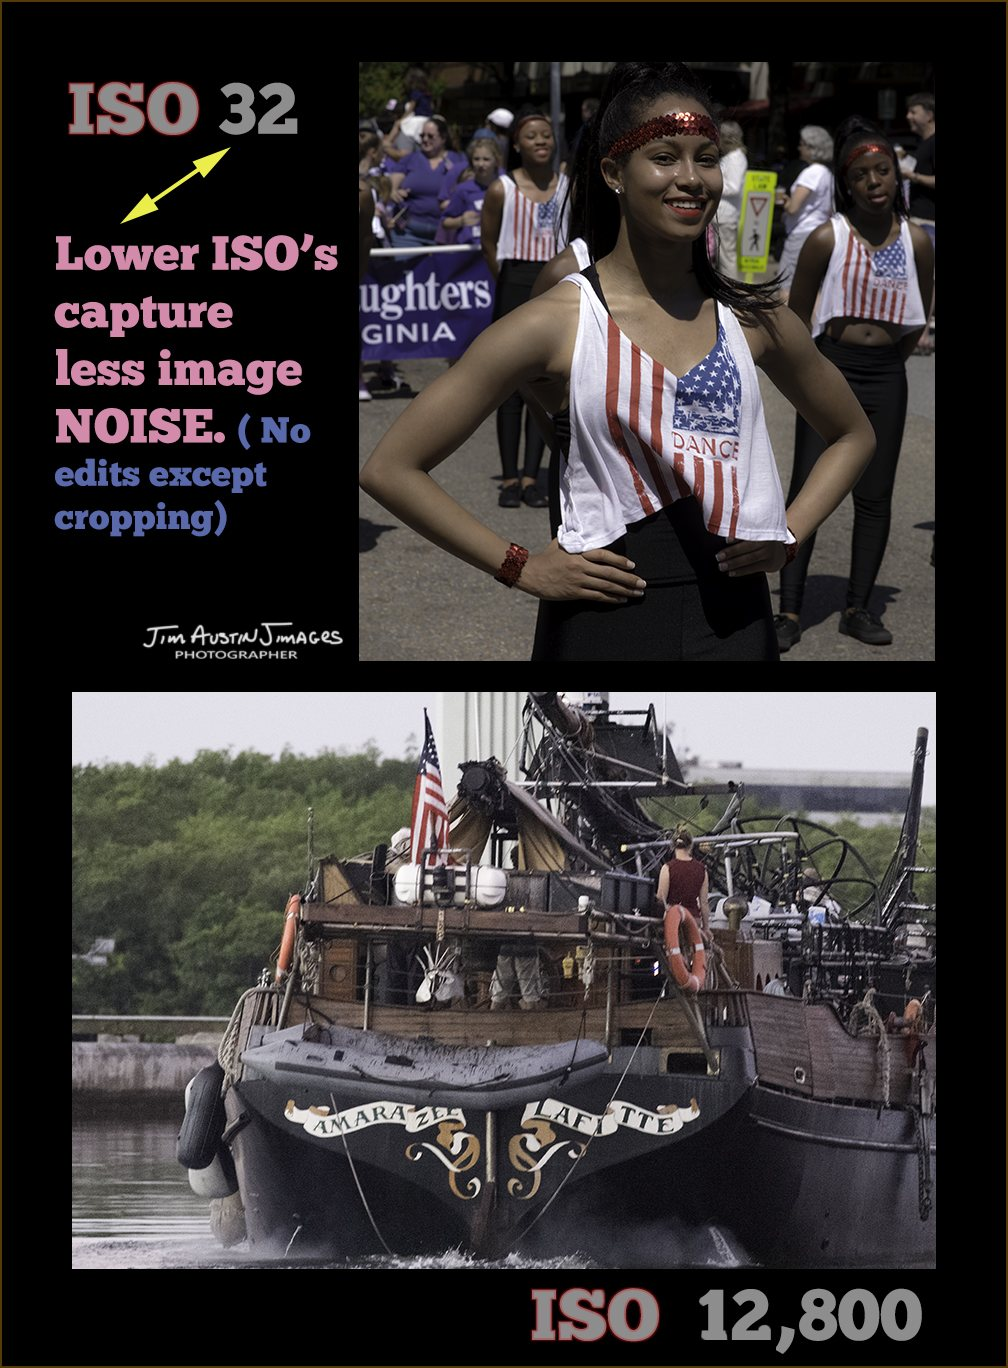 LOW ISO Less Noise Jim Austin Jimagesdotcom 1A